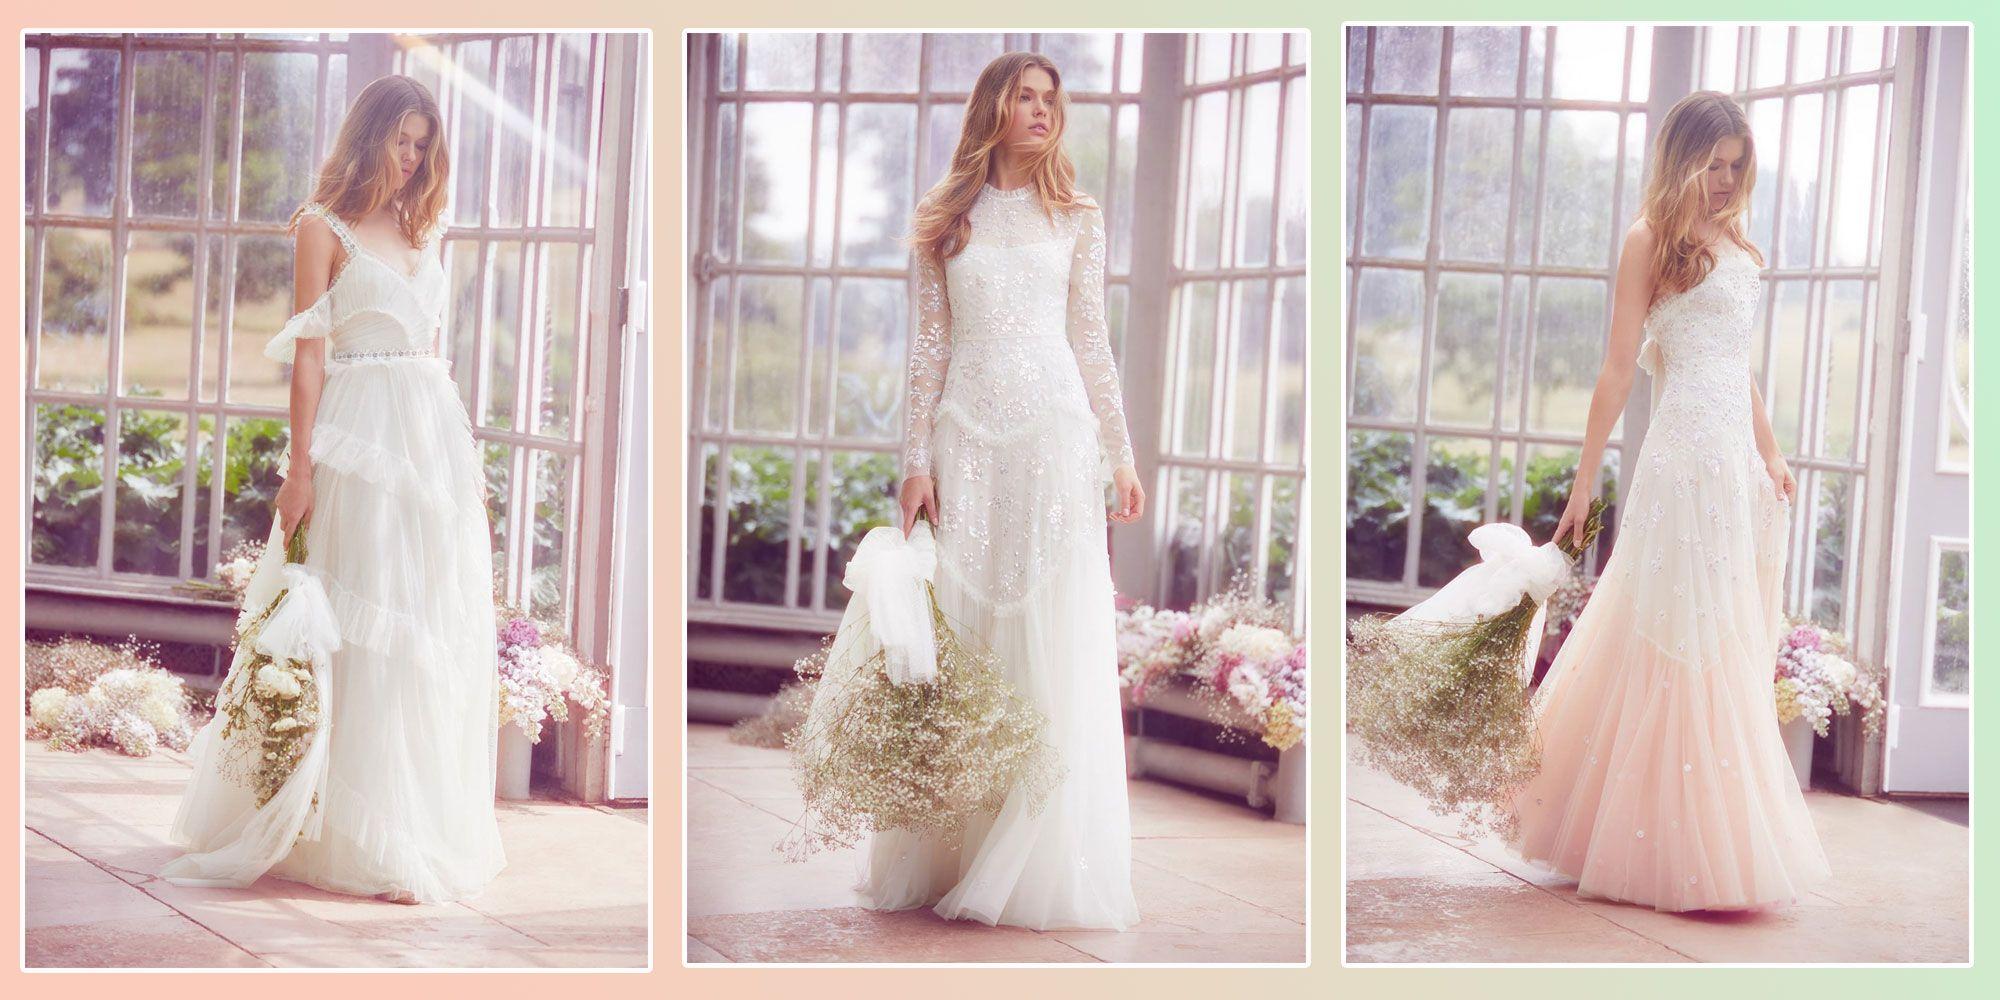 e05ddfd74 18 high street wedding dresses you ll love - high street brands that sell  cheap wedding dresses